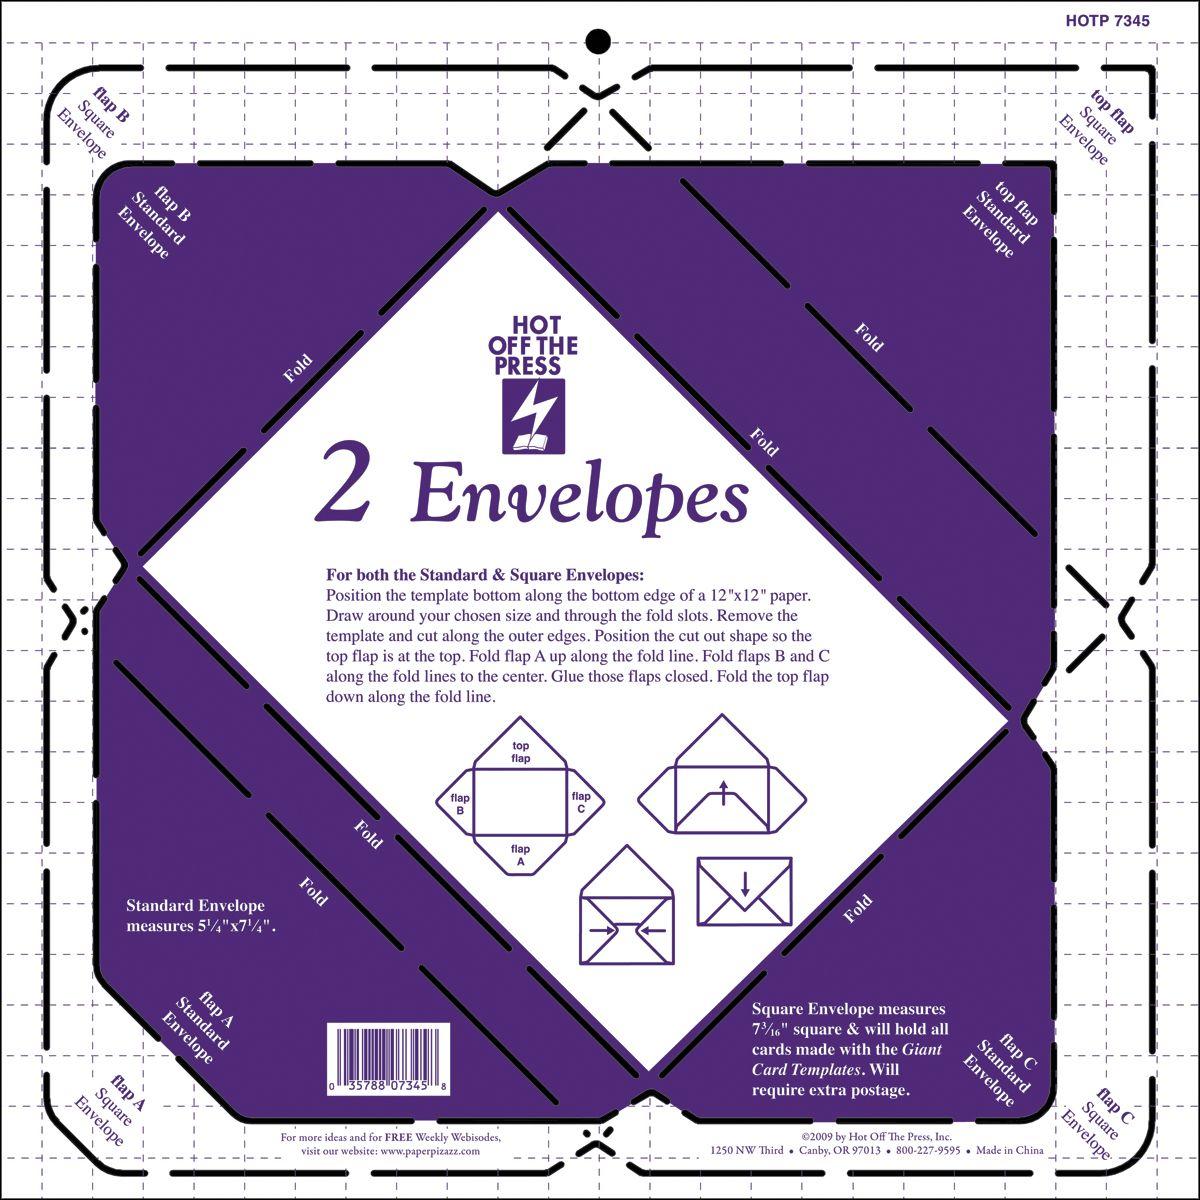 hot-off-the-press-templates-12-x12-2-envelopes-17.jpg (1200×1200)